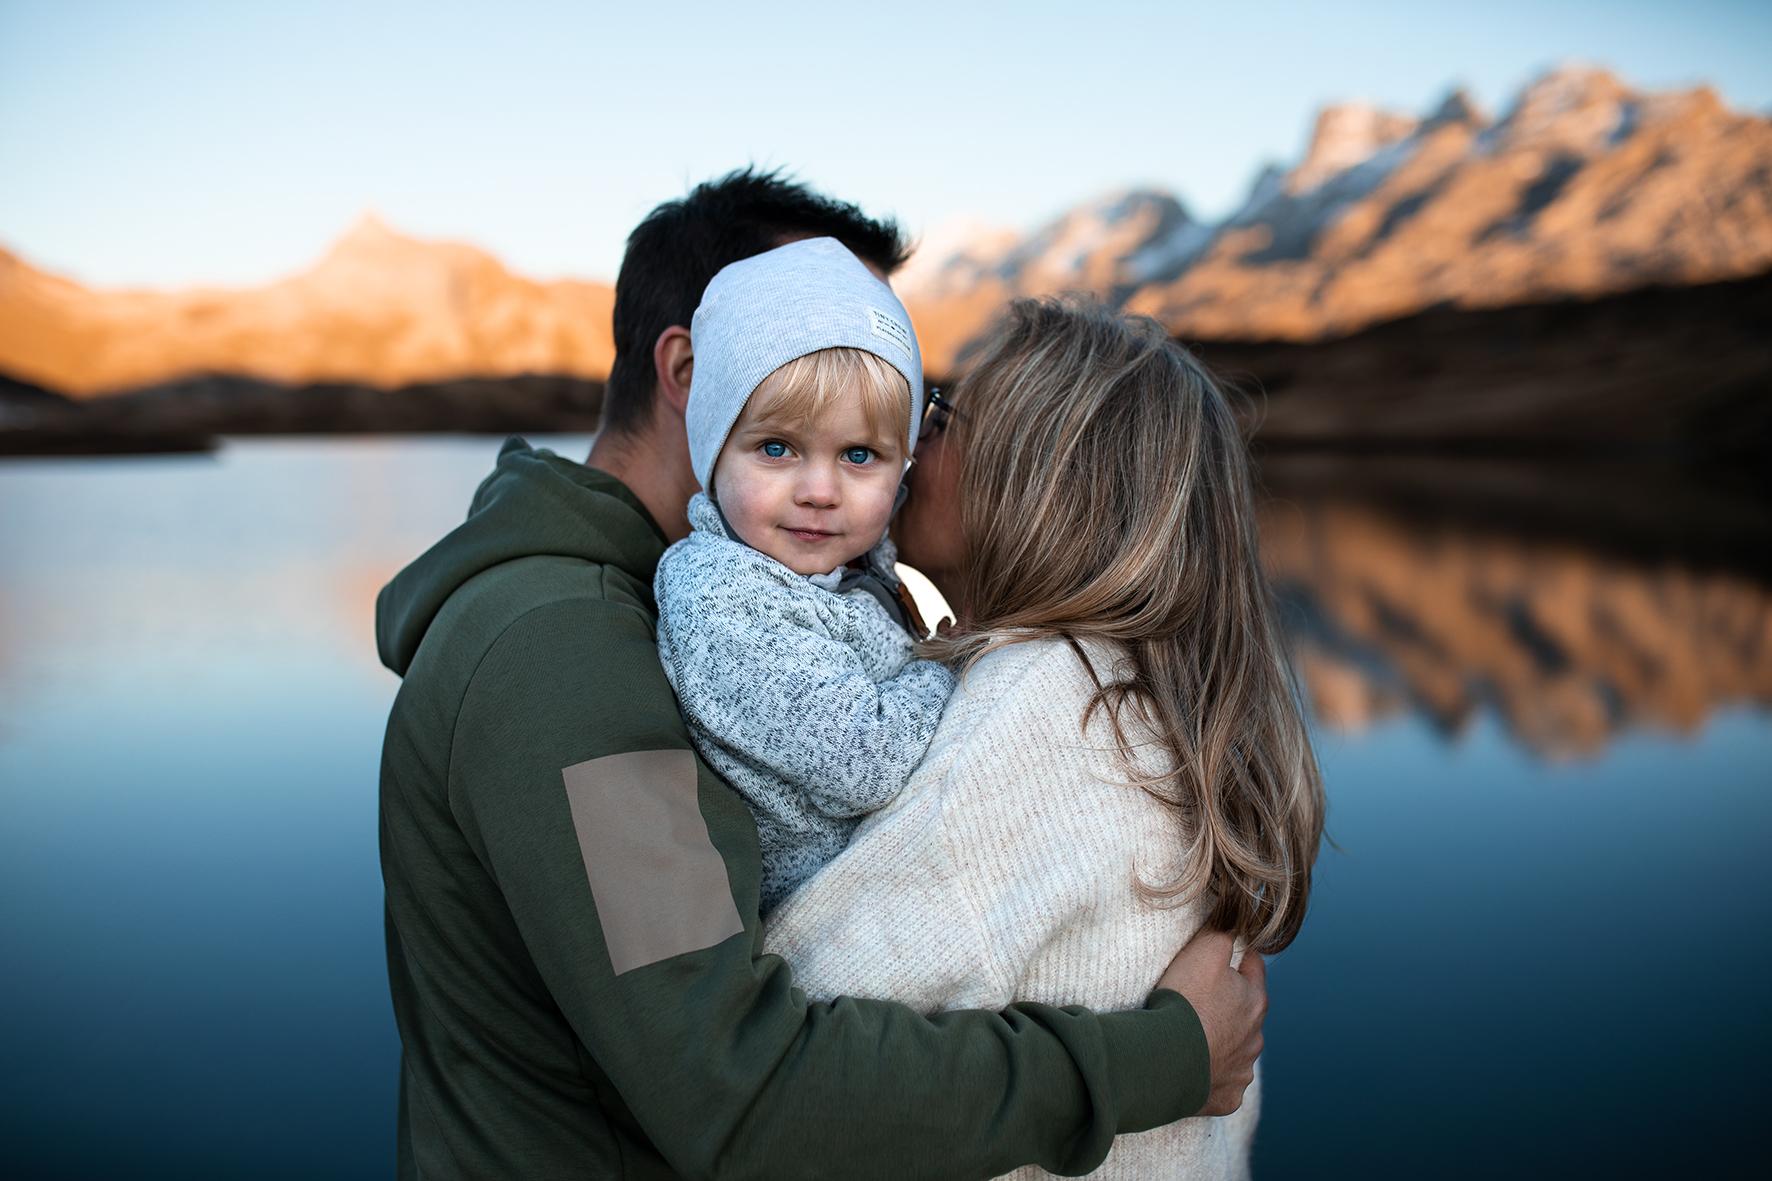 Familienshooting_Familienfotografie_Luzern_Schweiz_21